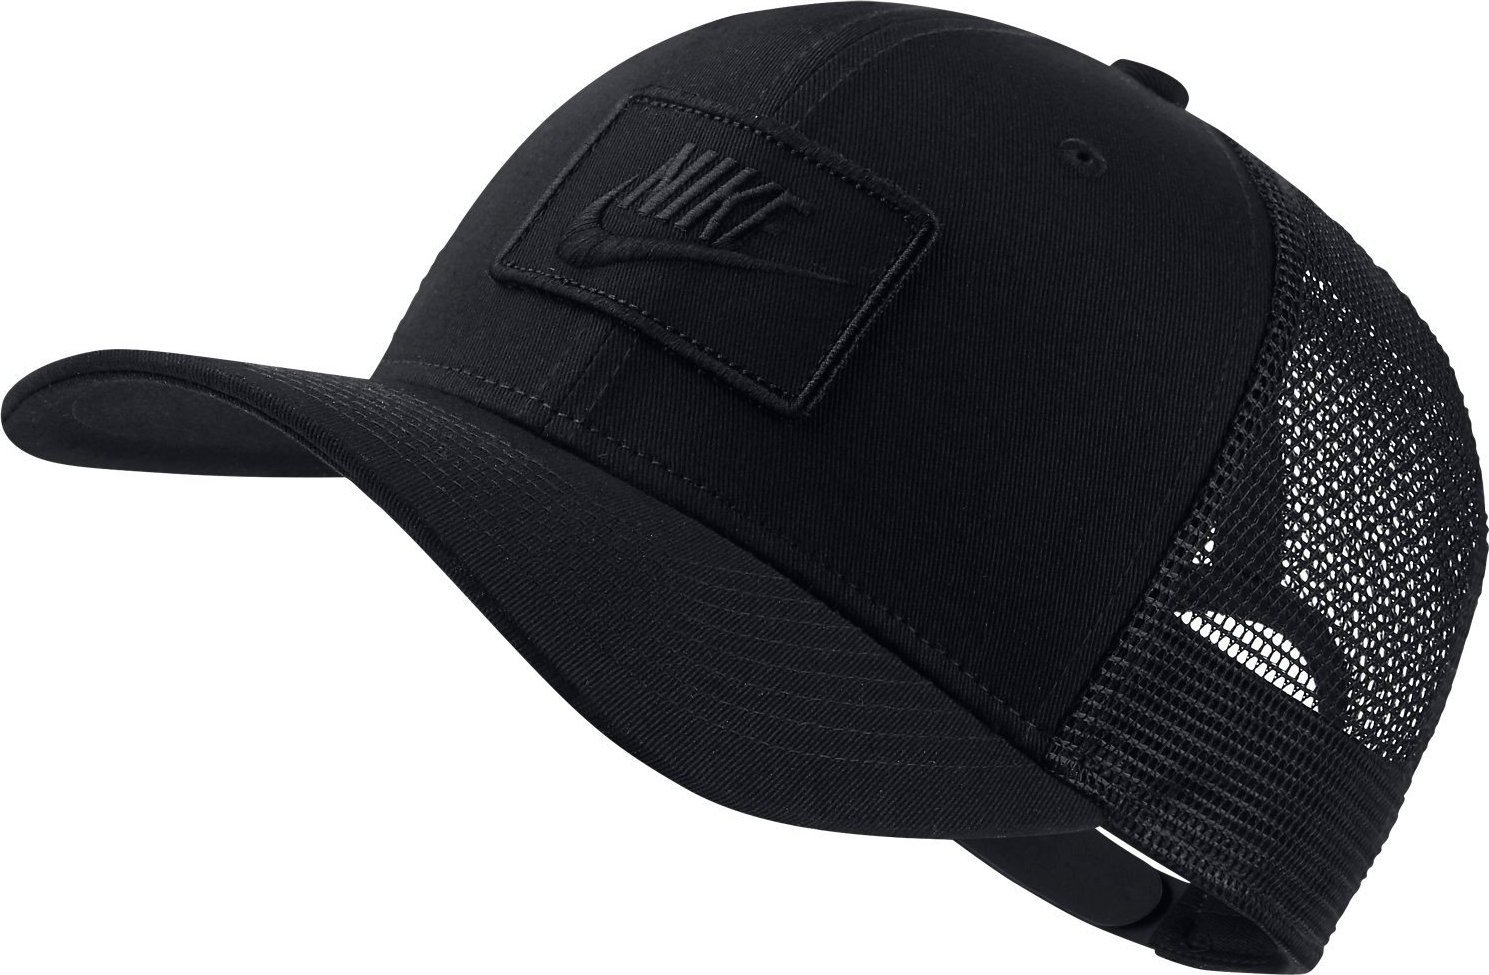 NIKE U Nsw Clc99 Cap Trucker černá Uni od 529 Kč • Zboží.cz ab18351de5